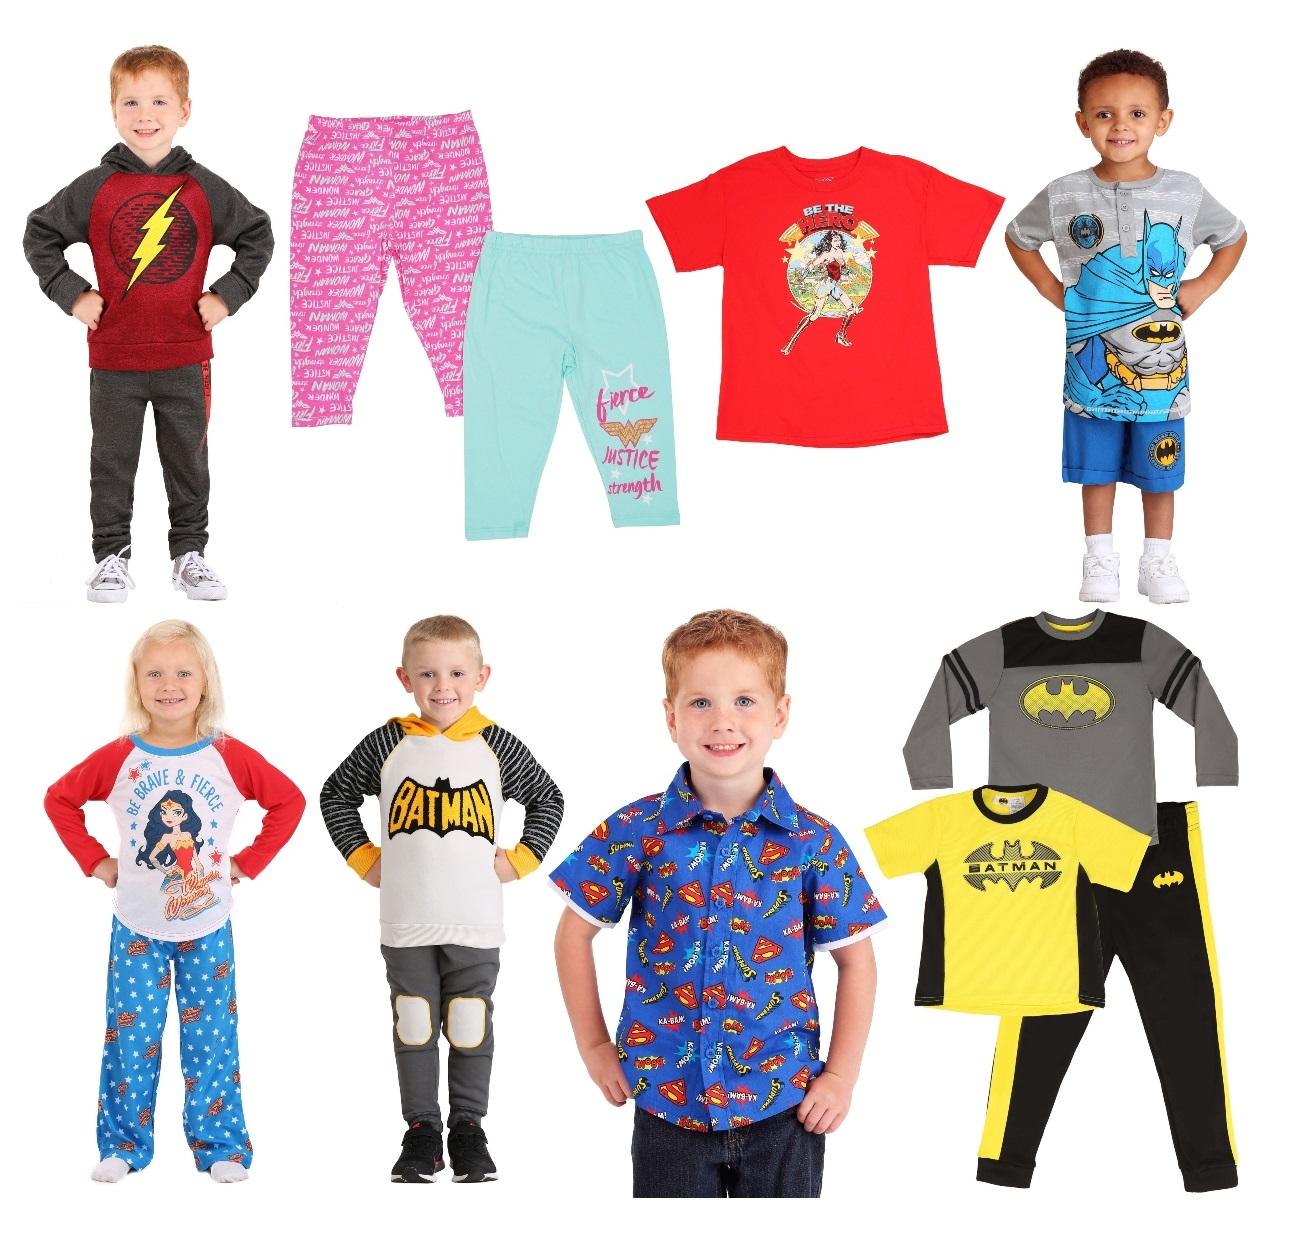 Superhero Kids' Clothes